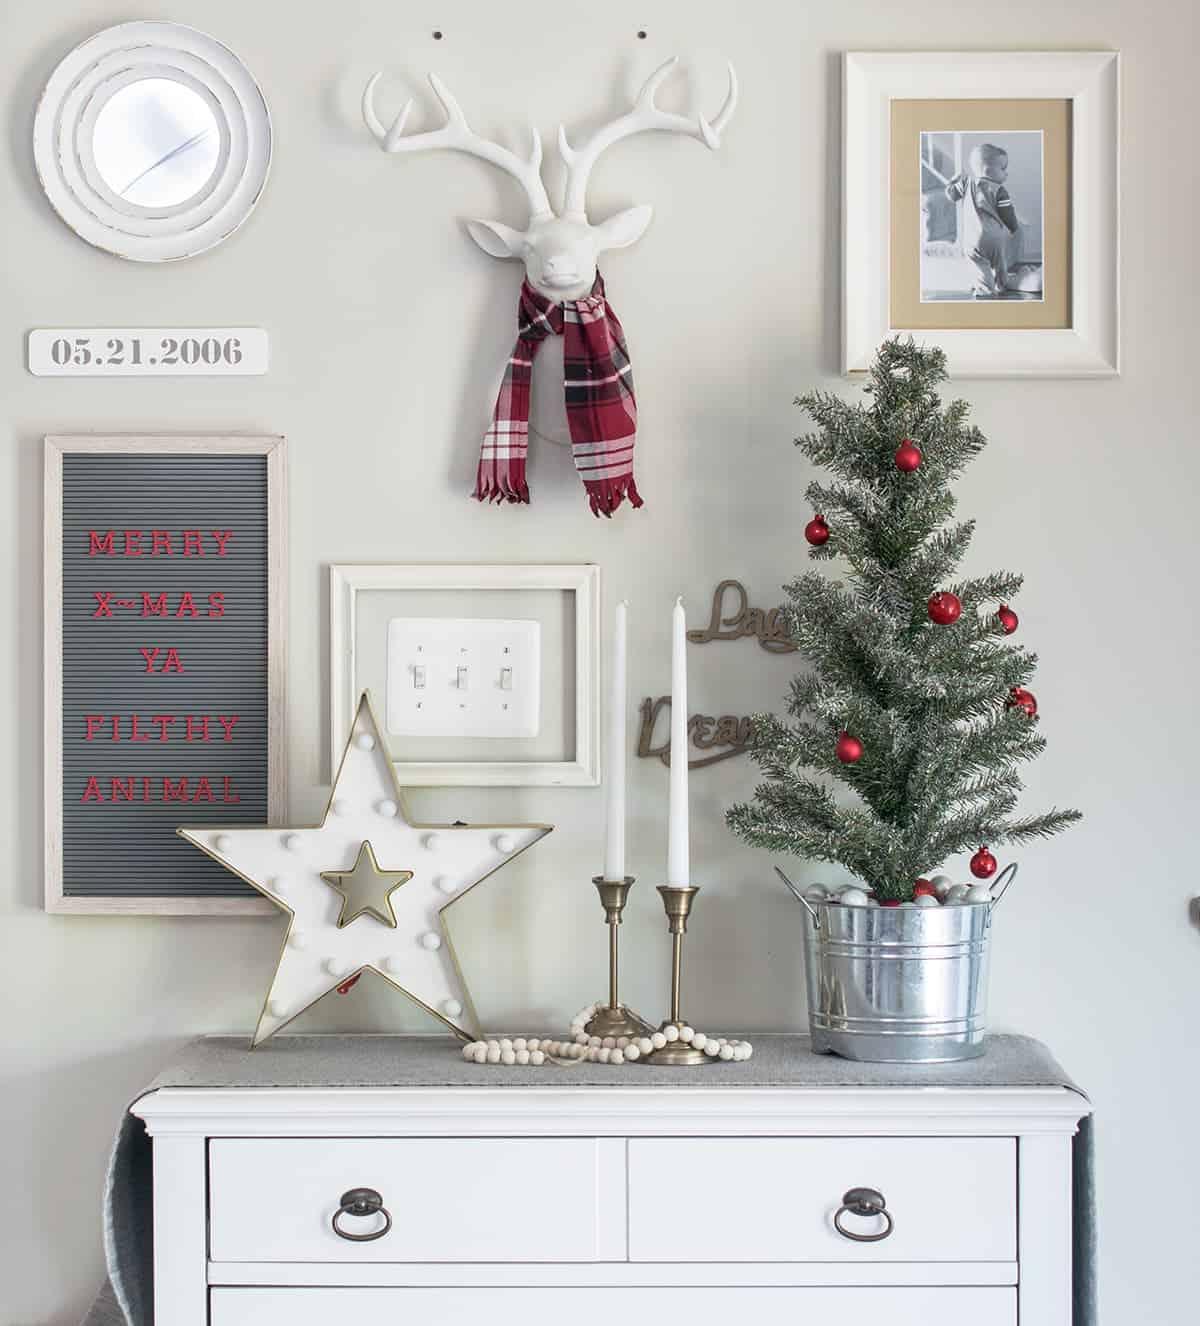 Christmas Gallery Wall